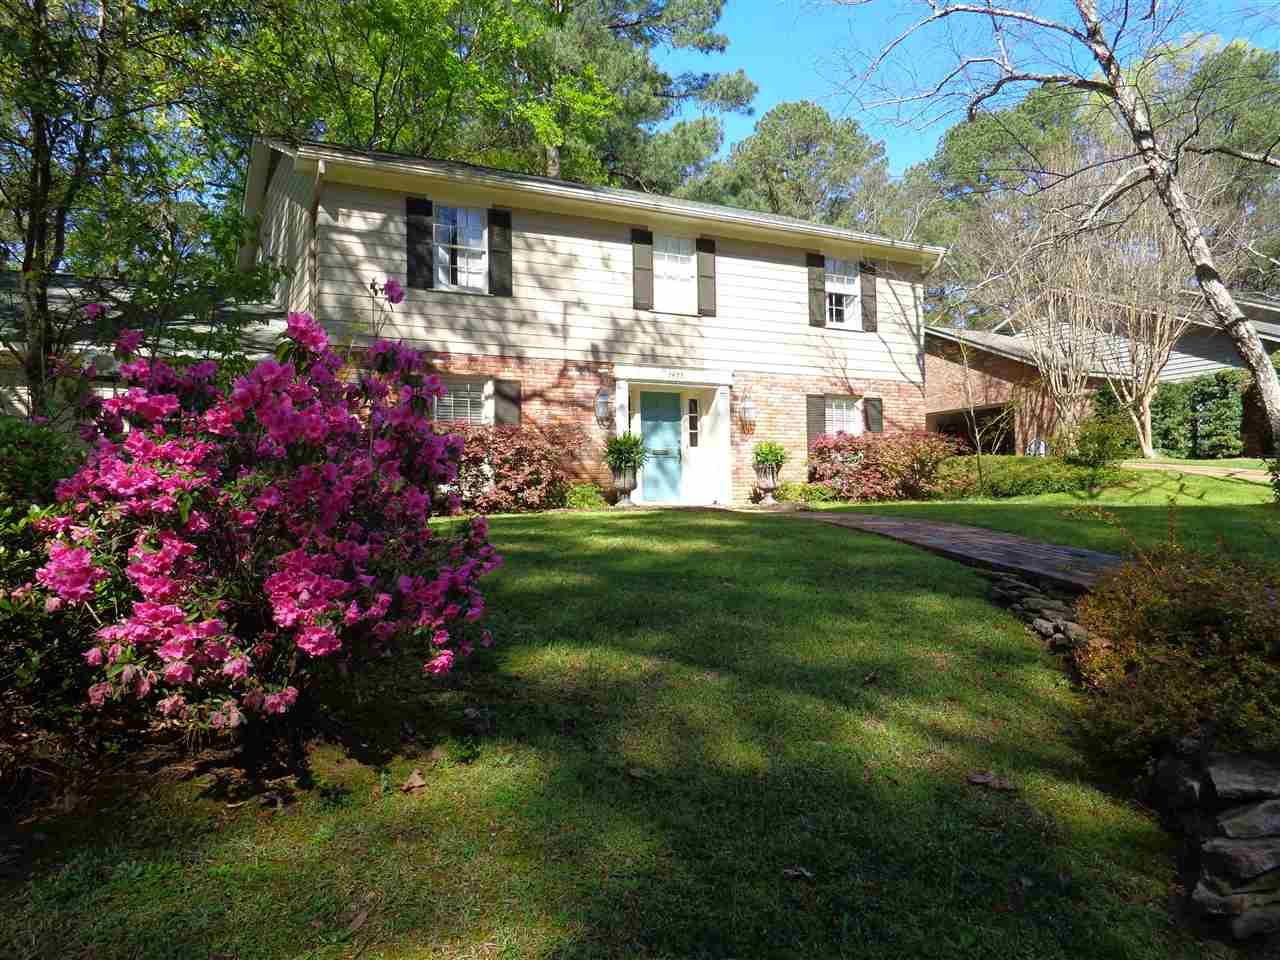 Real Estate for Sale, ListingId: 34204462, Jackson,MS39211